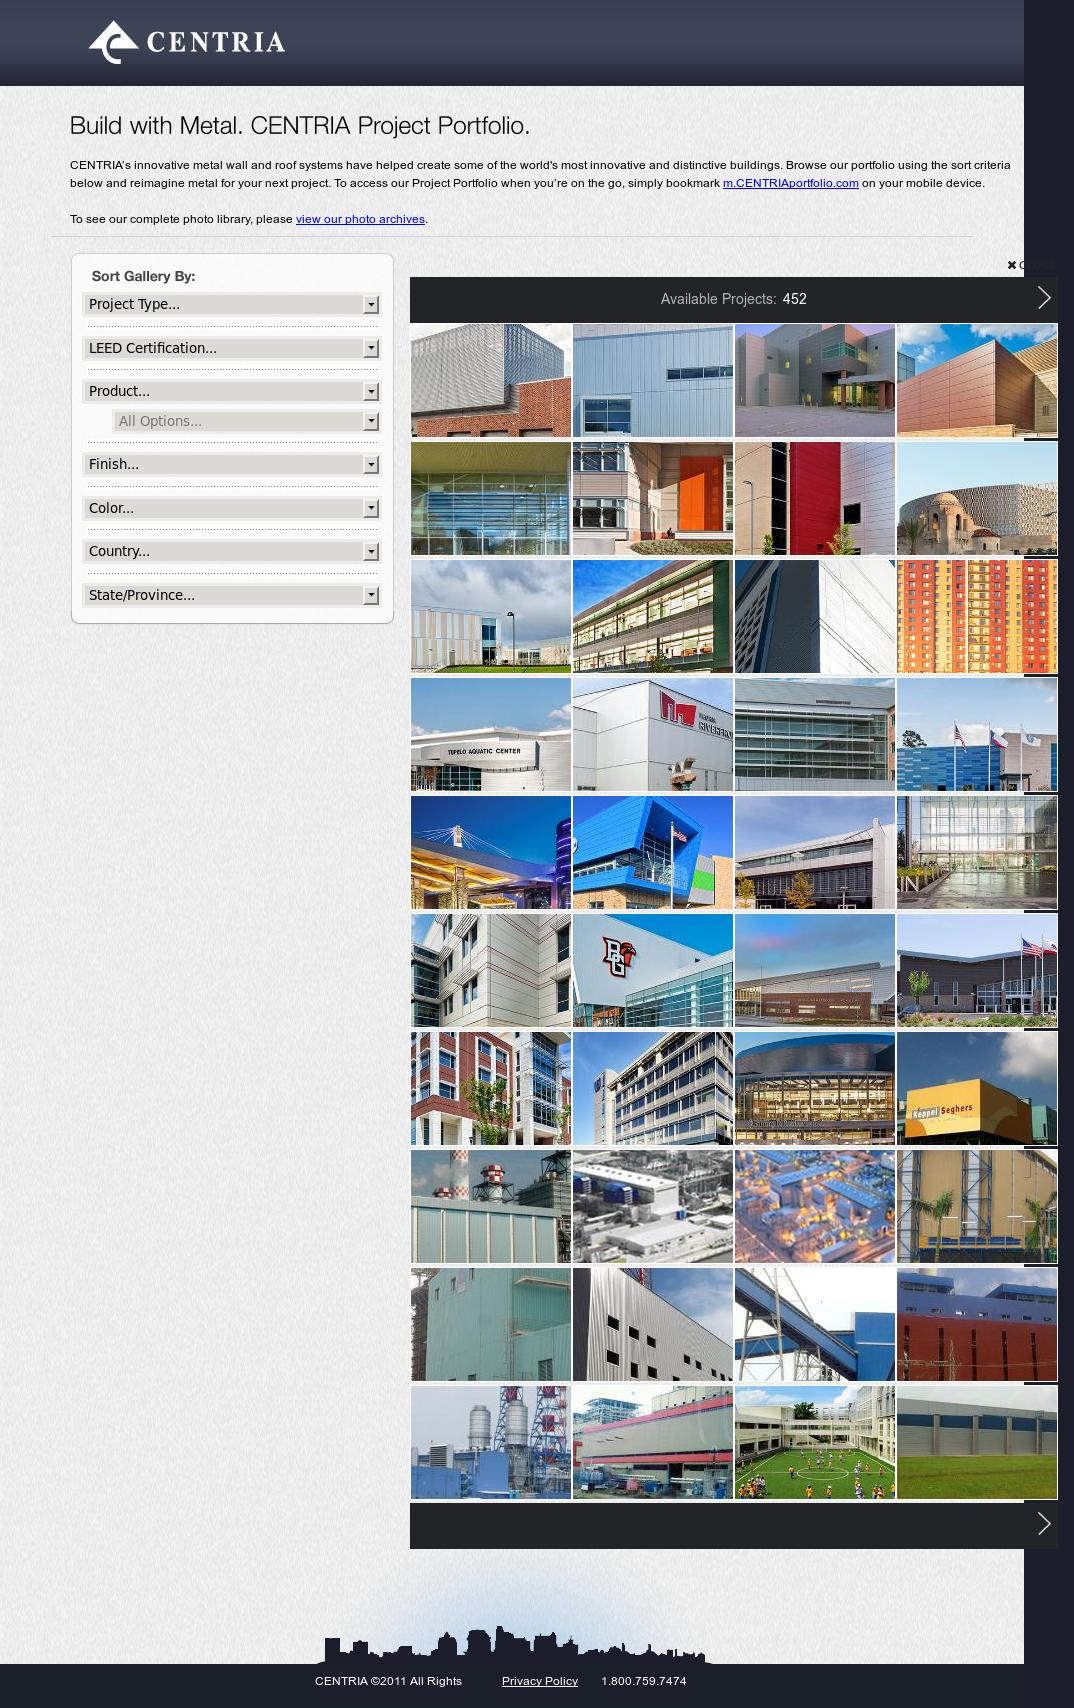 Centria Competitors, Revenue and Employees - Owler Company Profile